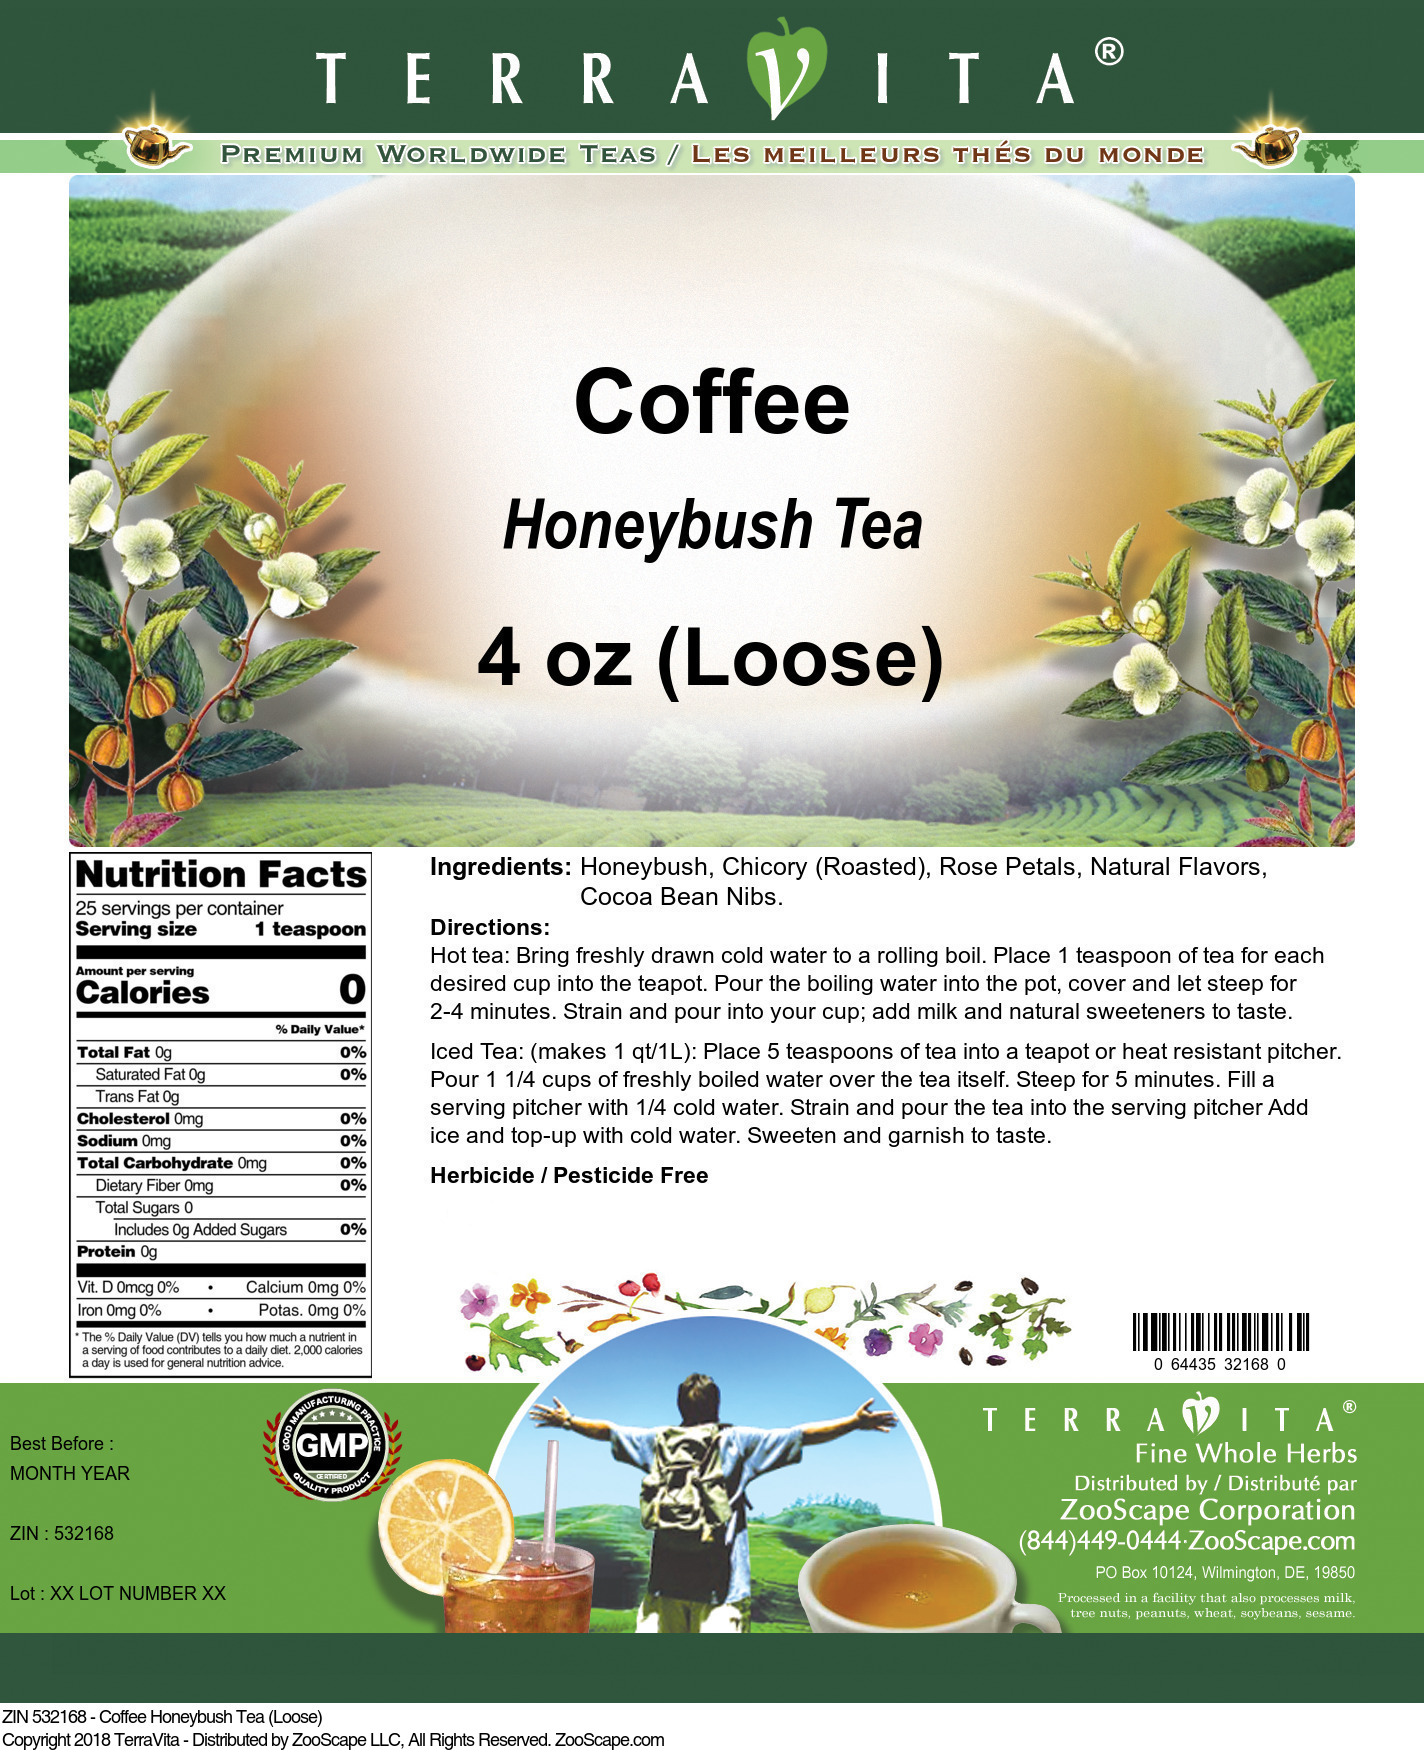 Coffee Honeybush Tea (Loose)